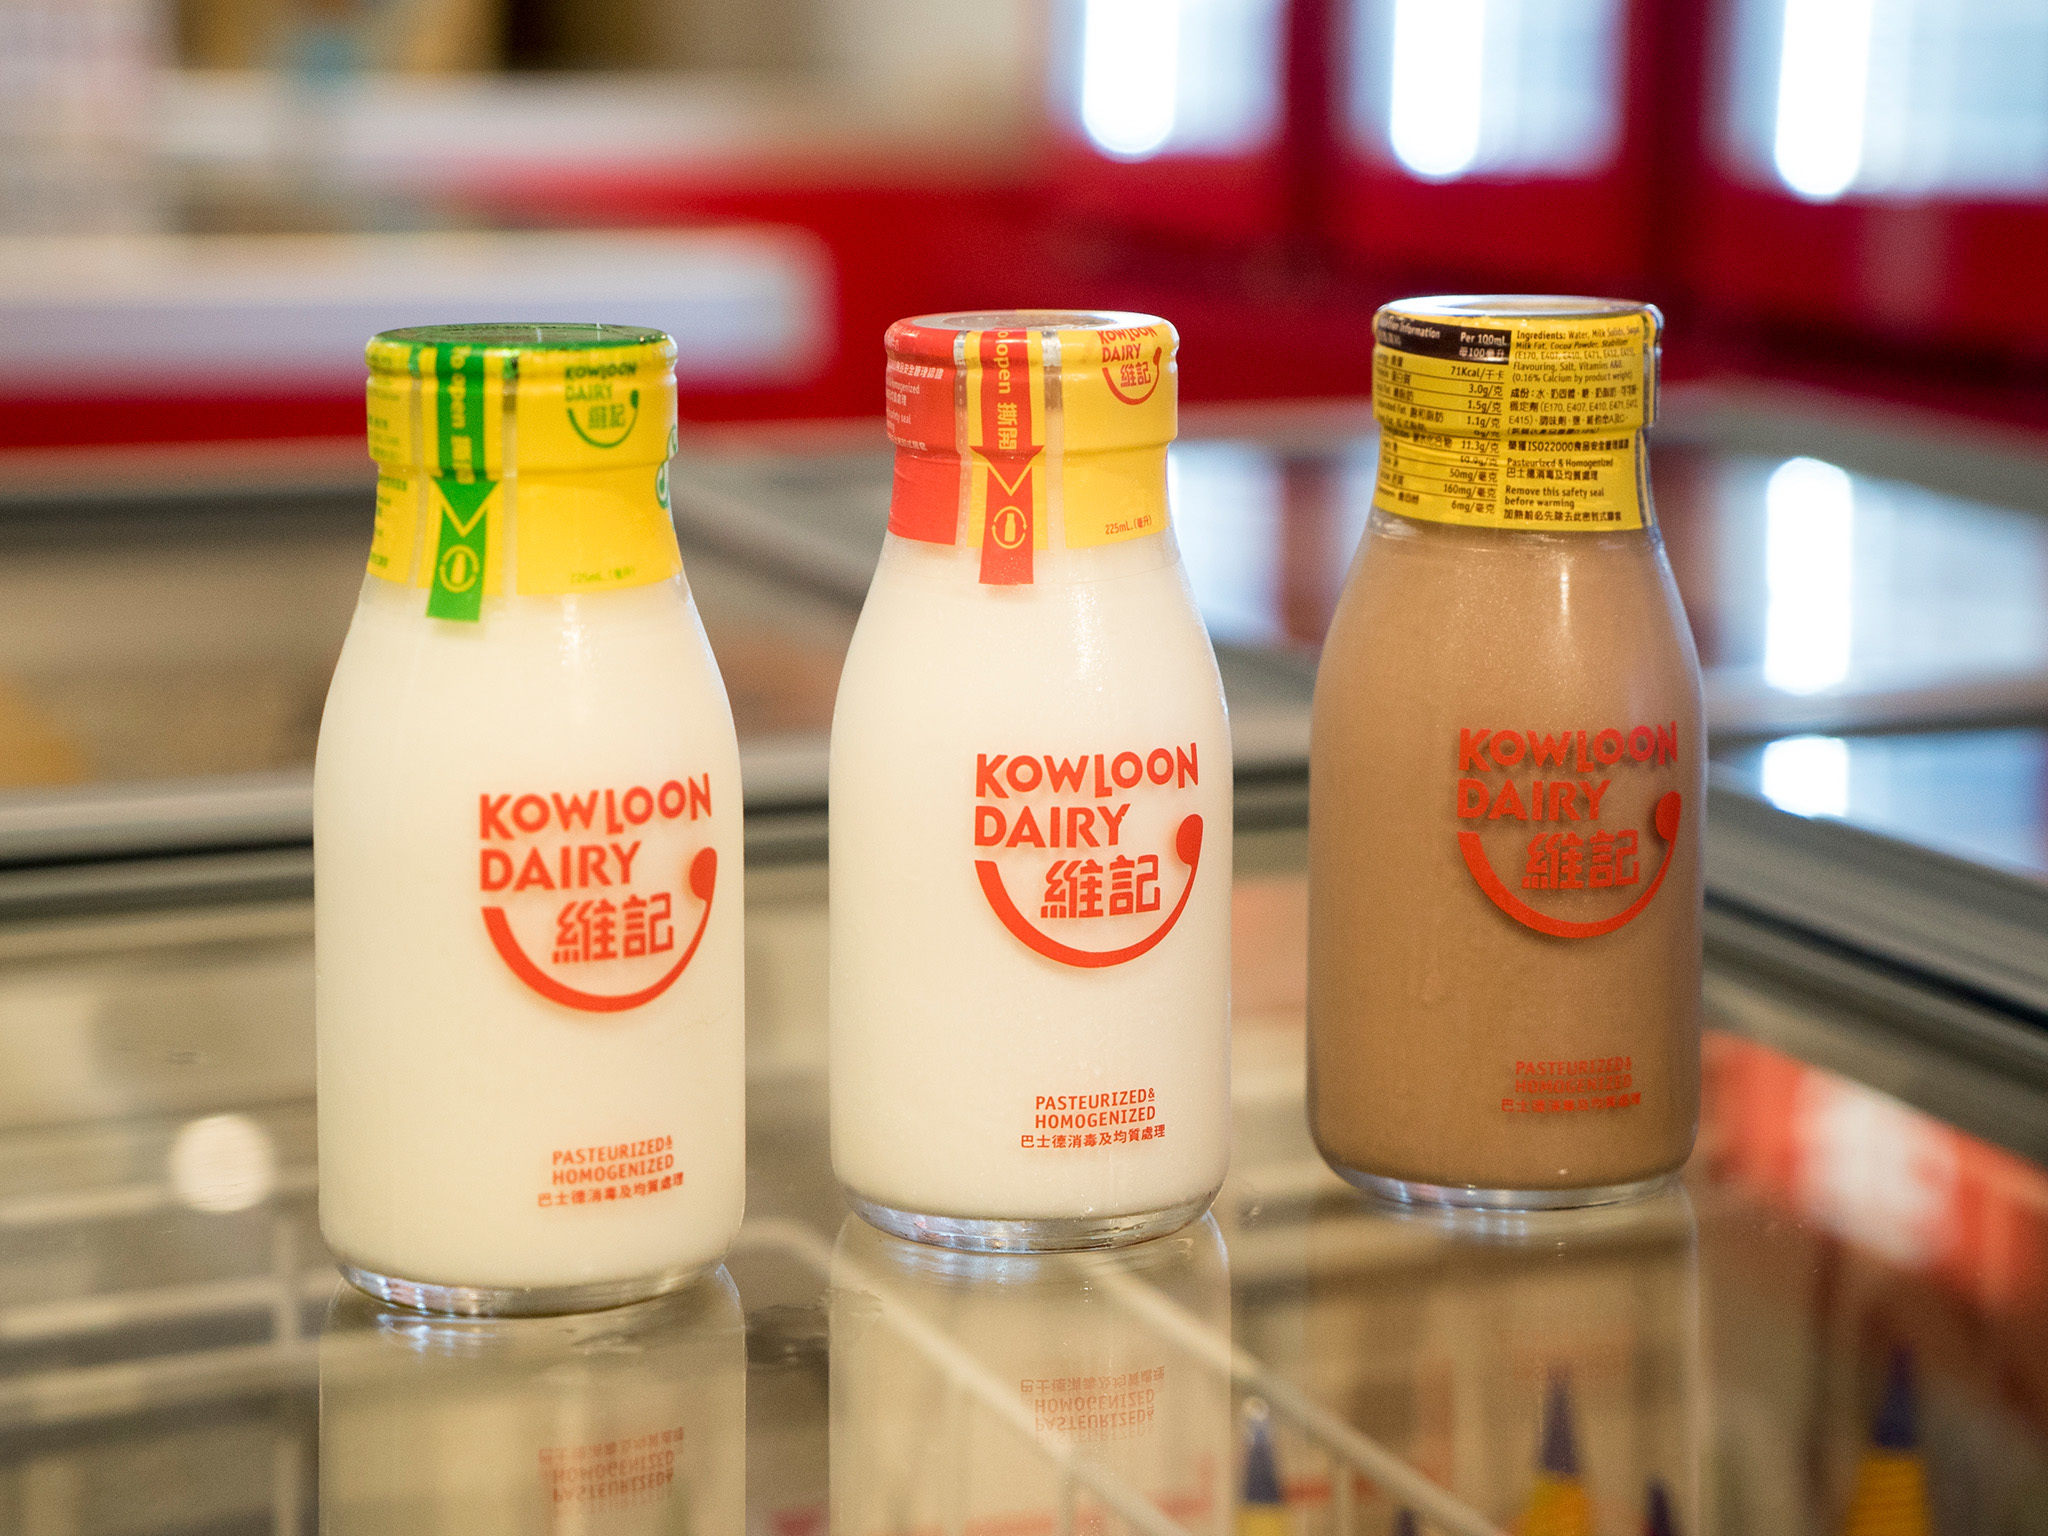 Kowloon Dairy